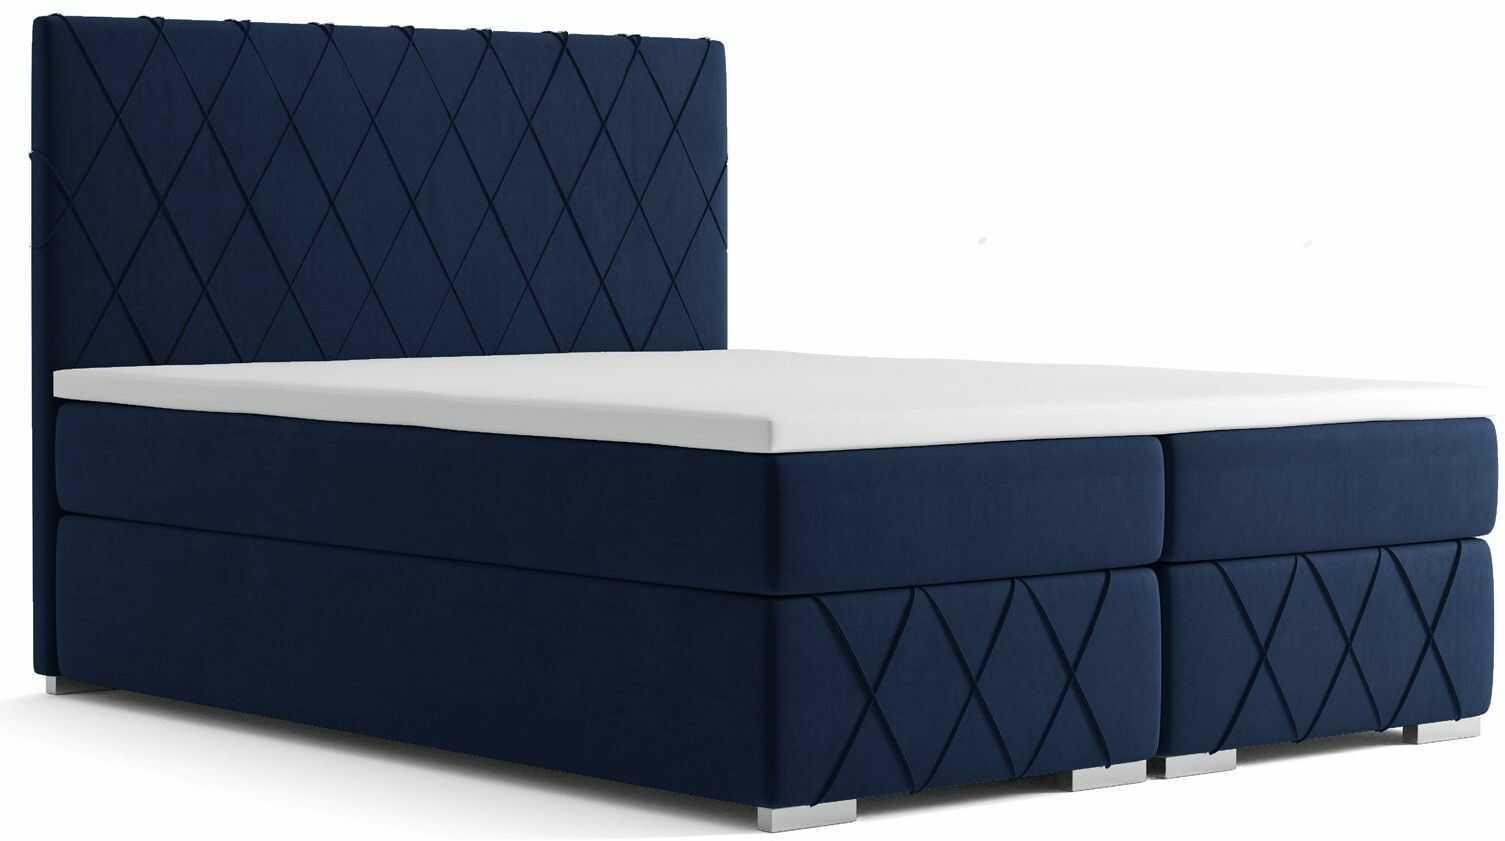 Podwójne łóżko boxspring Elise 140x200 - 58 kolorów